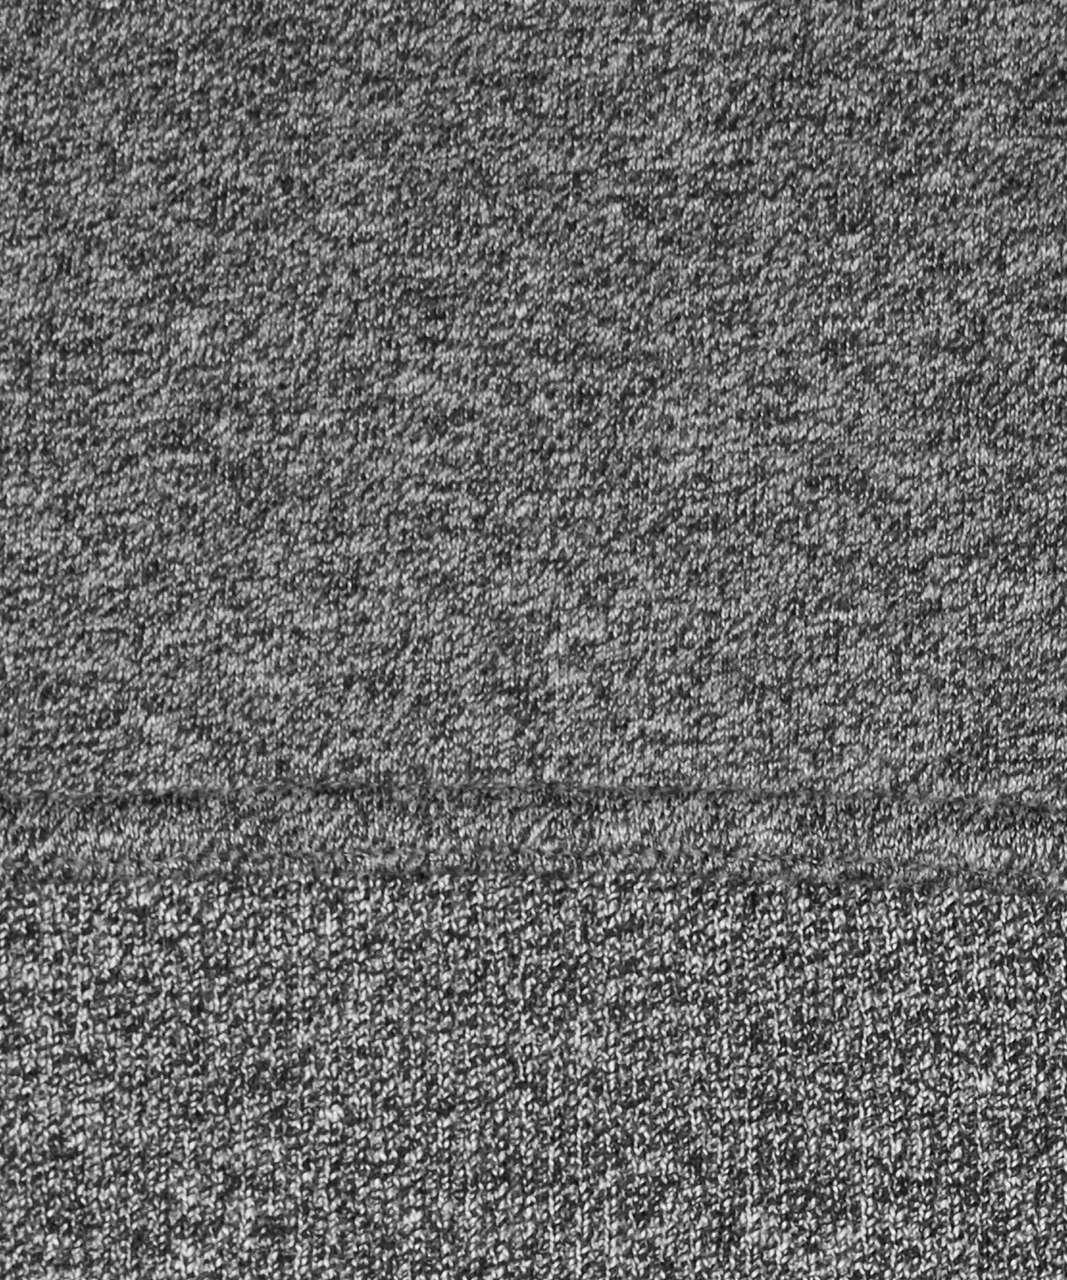 Lululemon All Yours Zip Hoodie - Heathered Speckled Black / Black